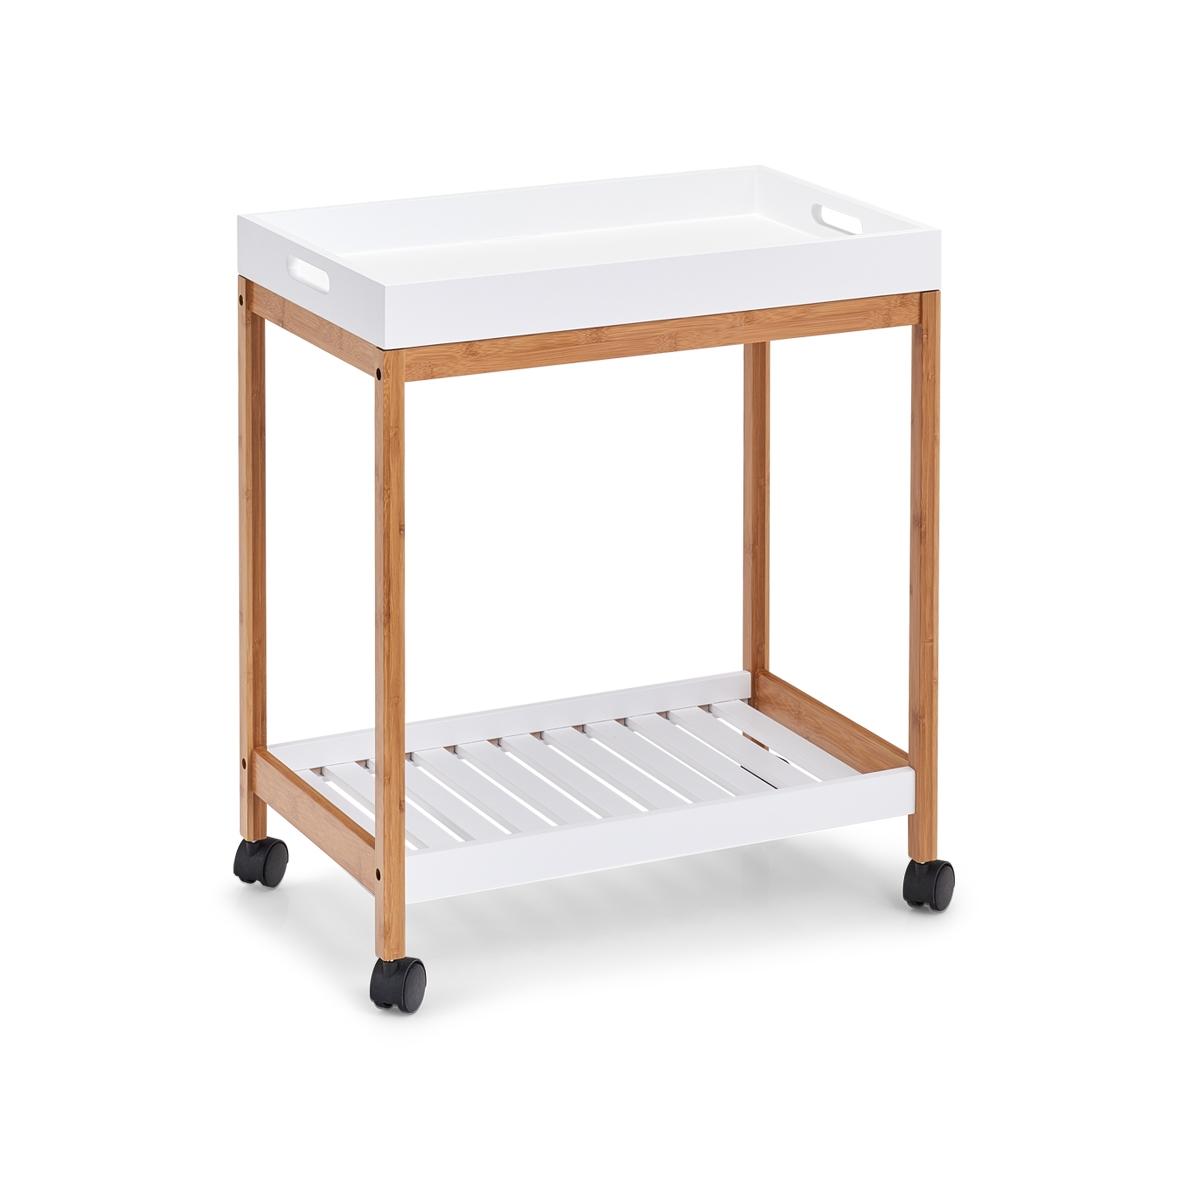 Masa minibar mobila Tray, Bamboo MDF Alb / Natural, L55xl34xH62 cm imagine